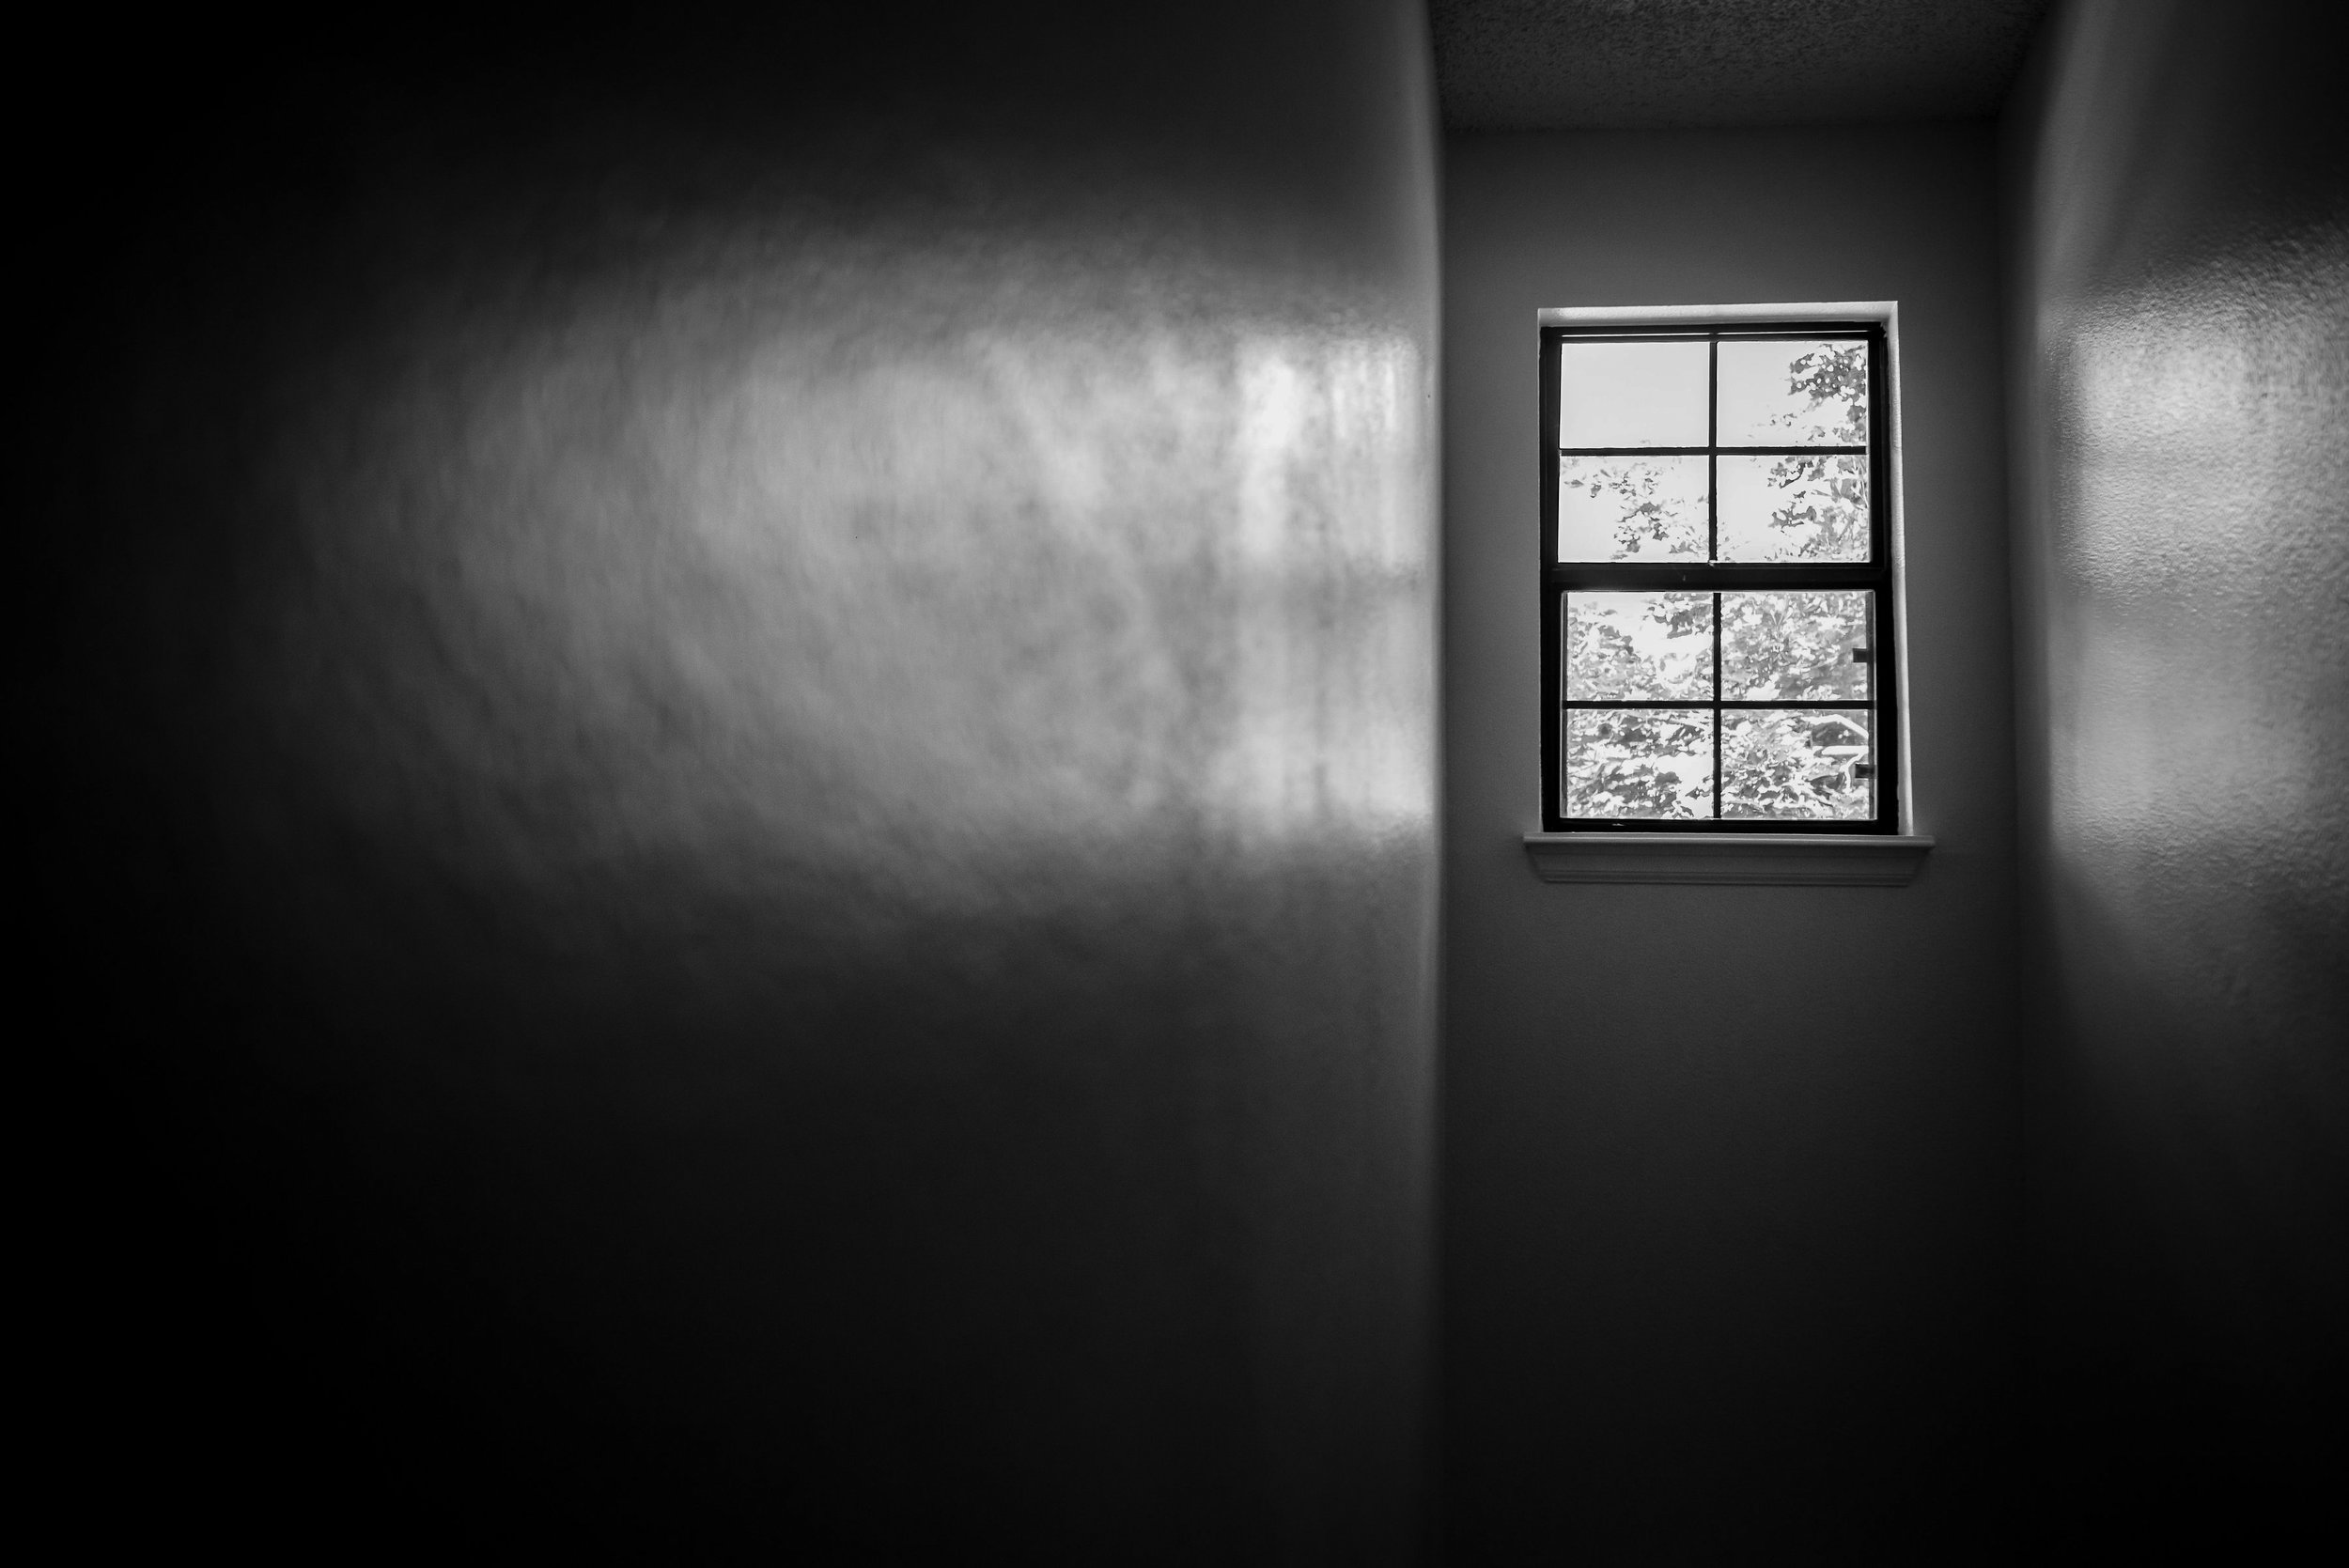 image-of-window-at-homebirth